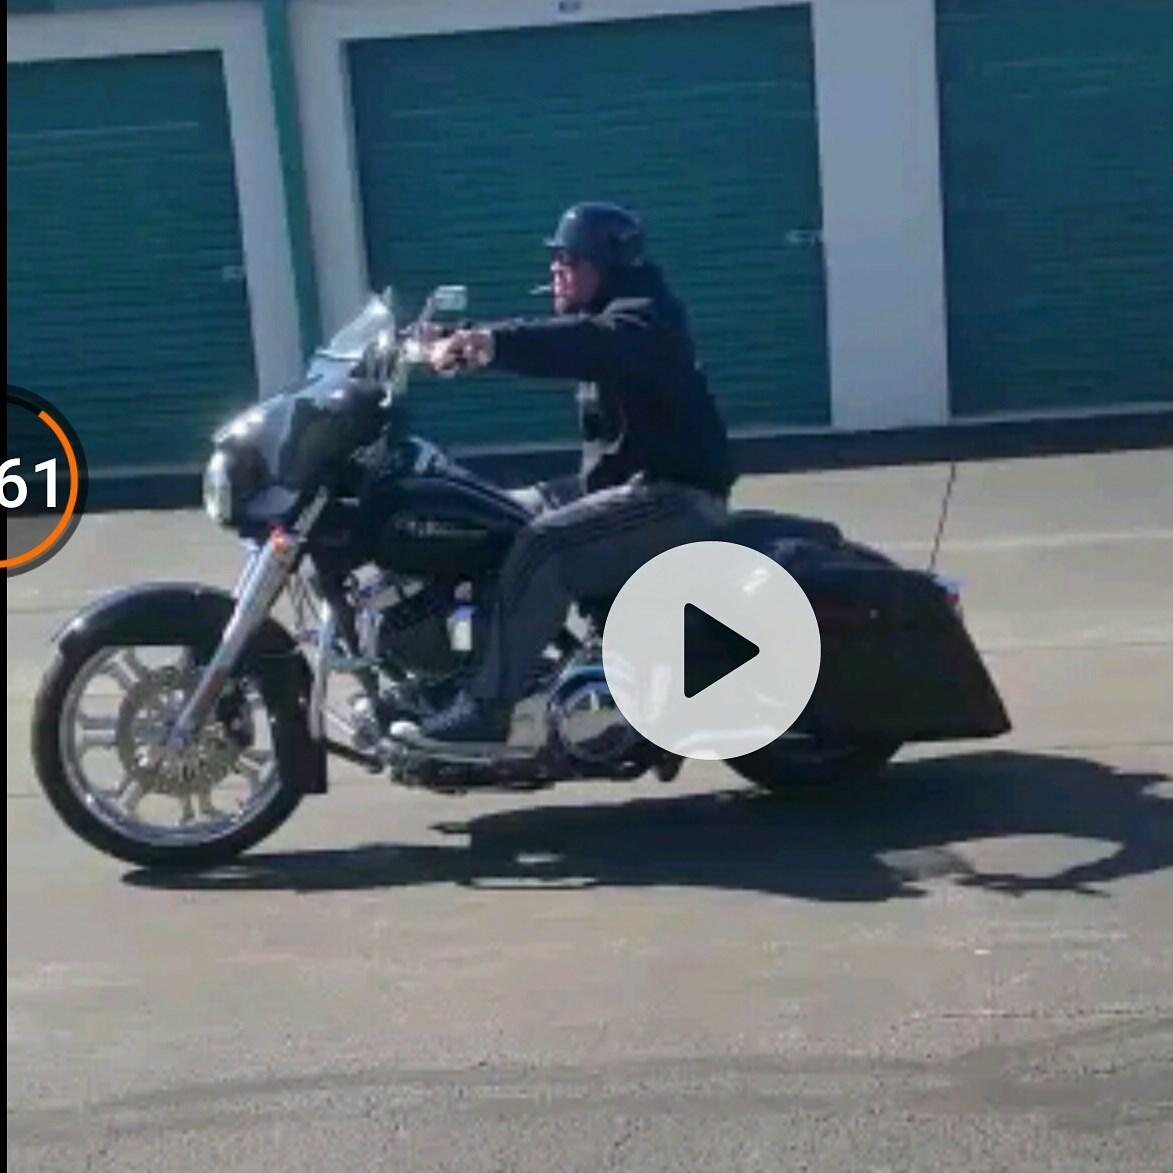 2016 Harley Dealer Newark De >> 2009 Harley-Davidson® FLHX Street Glide® (Harley Black), Newark, Delaware (670351) | ChopperExchange